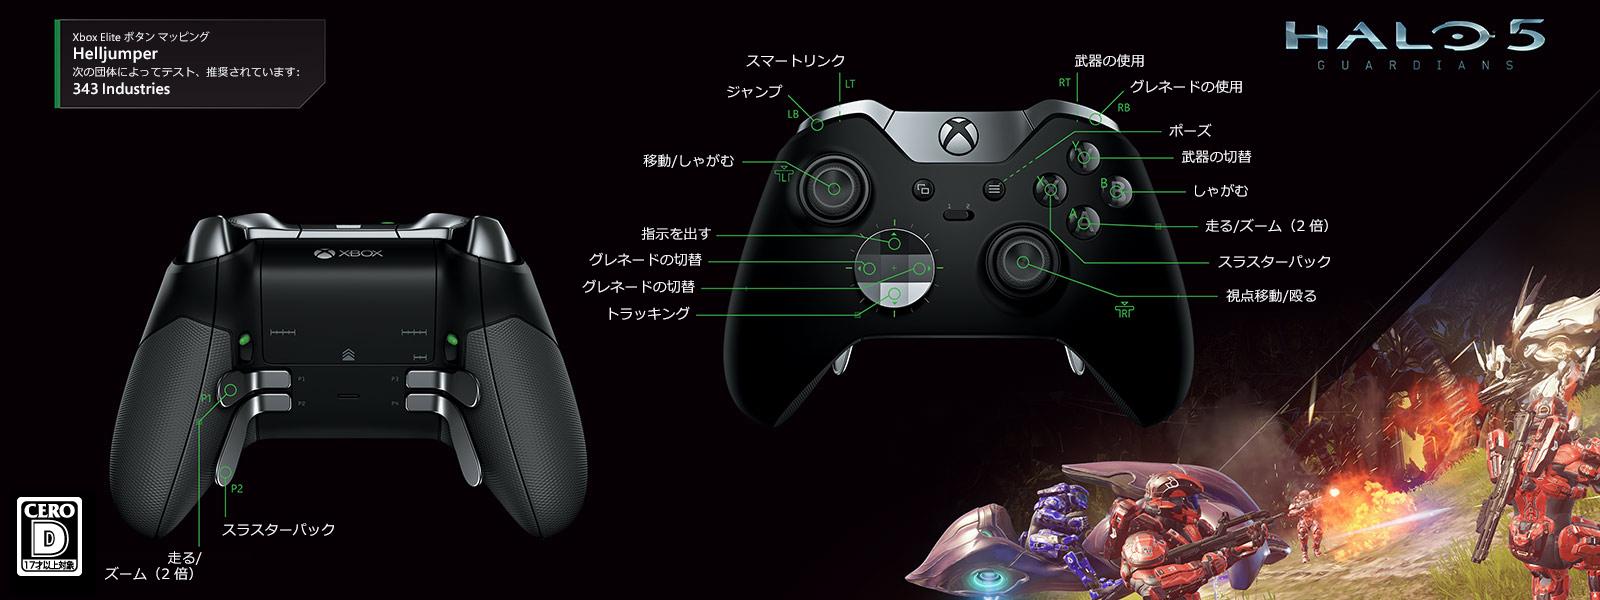 Halo 5 - ヘルジャンパー Elite マッピング